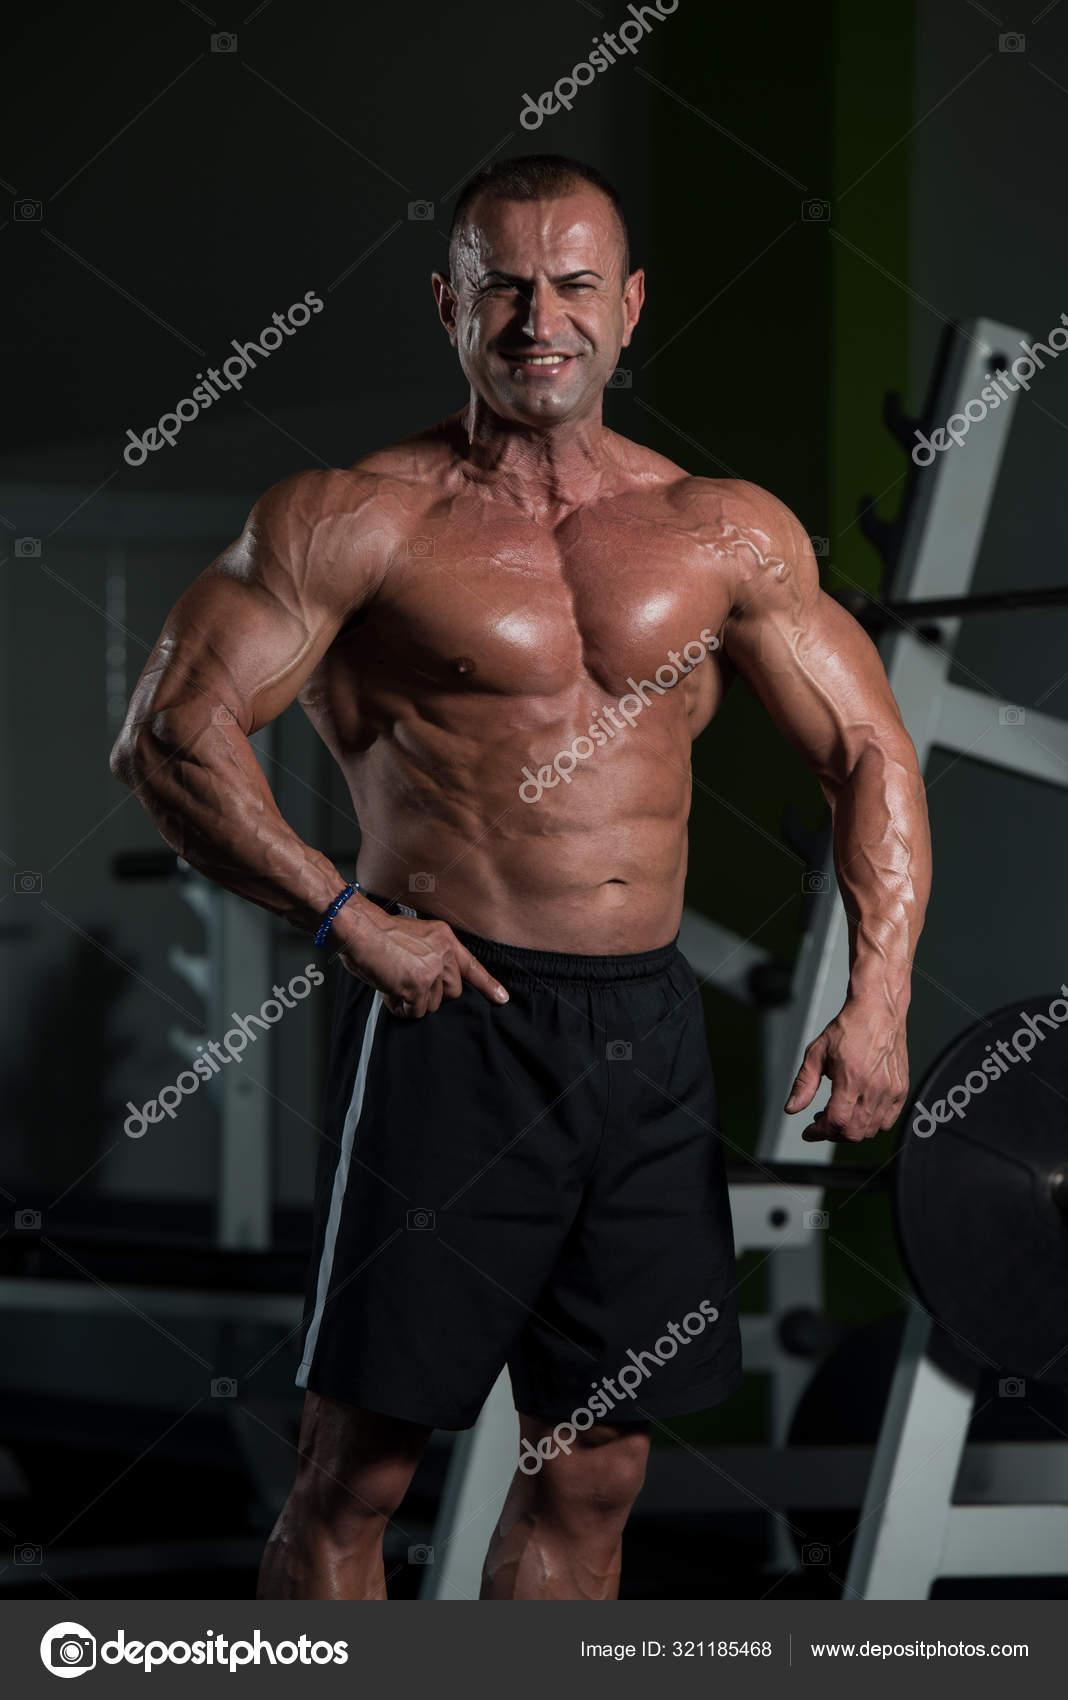 Mann trainierter körper Körperfettanteil beim